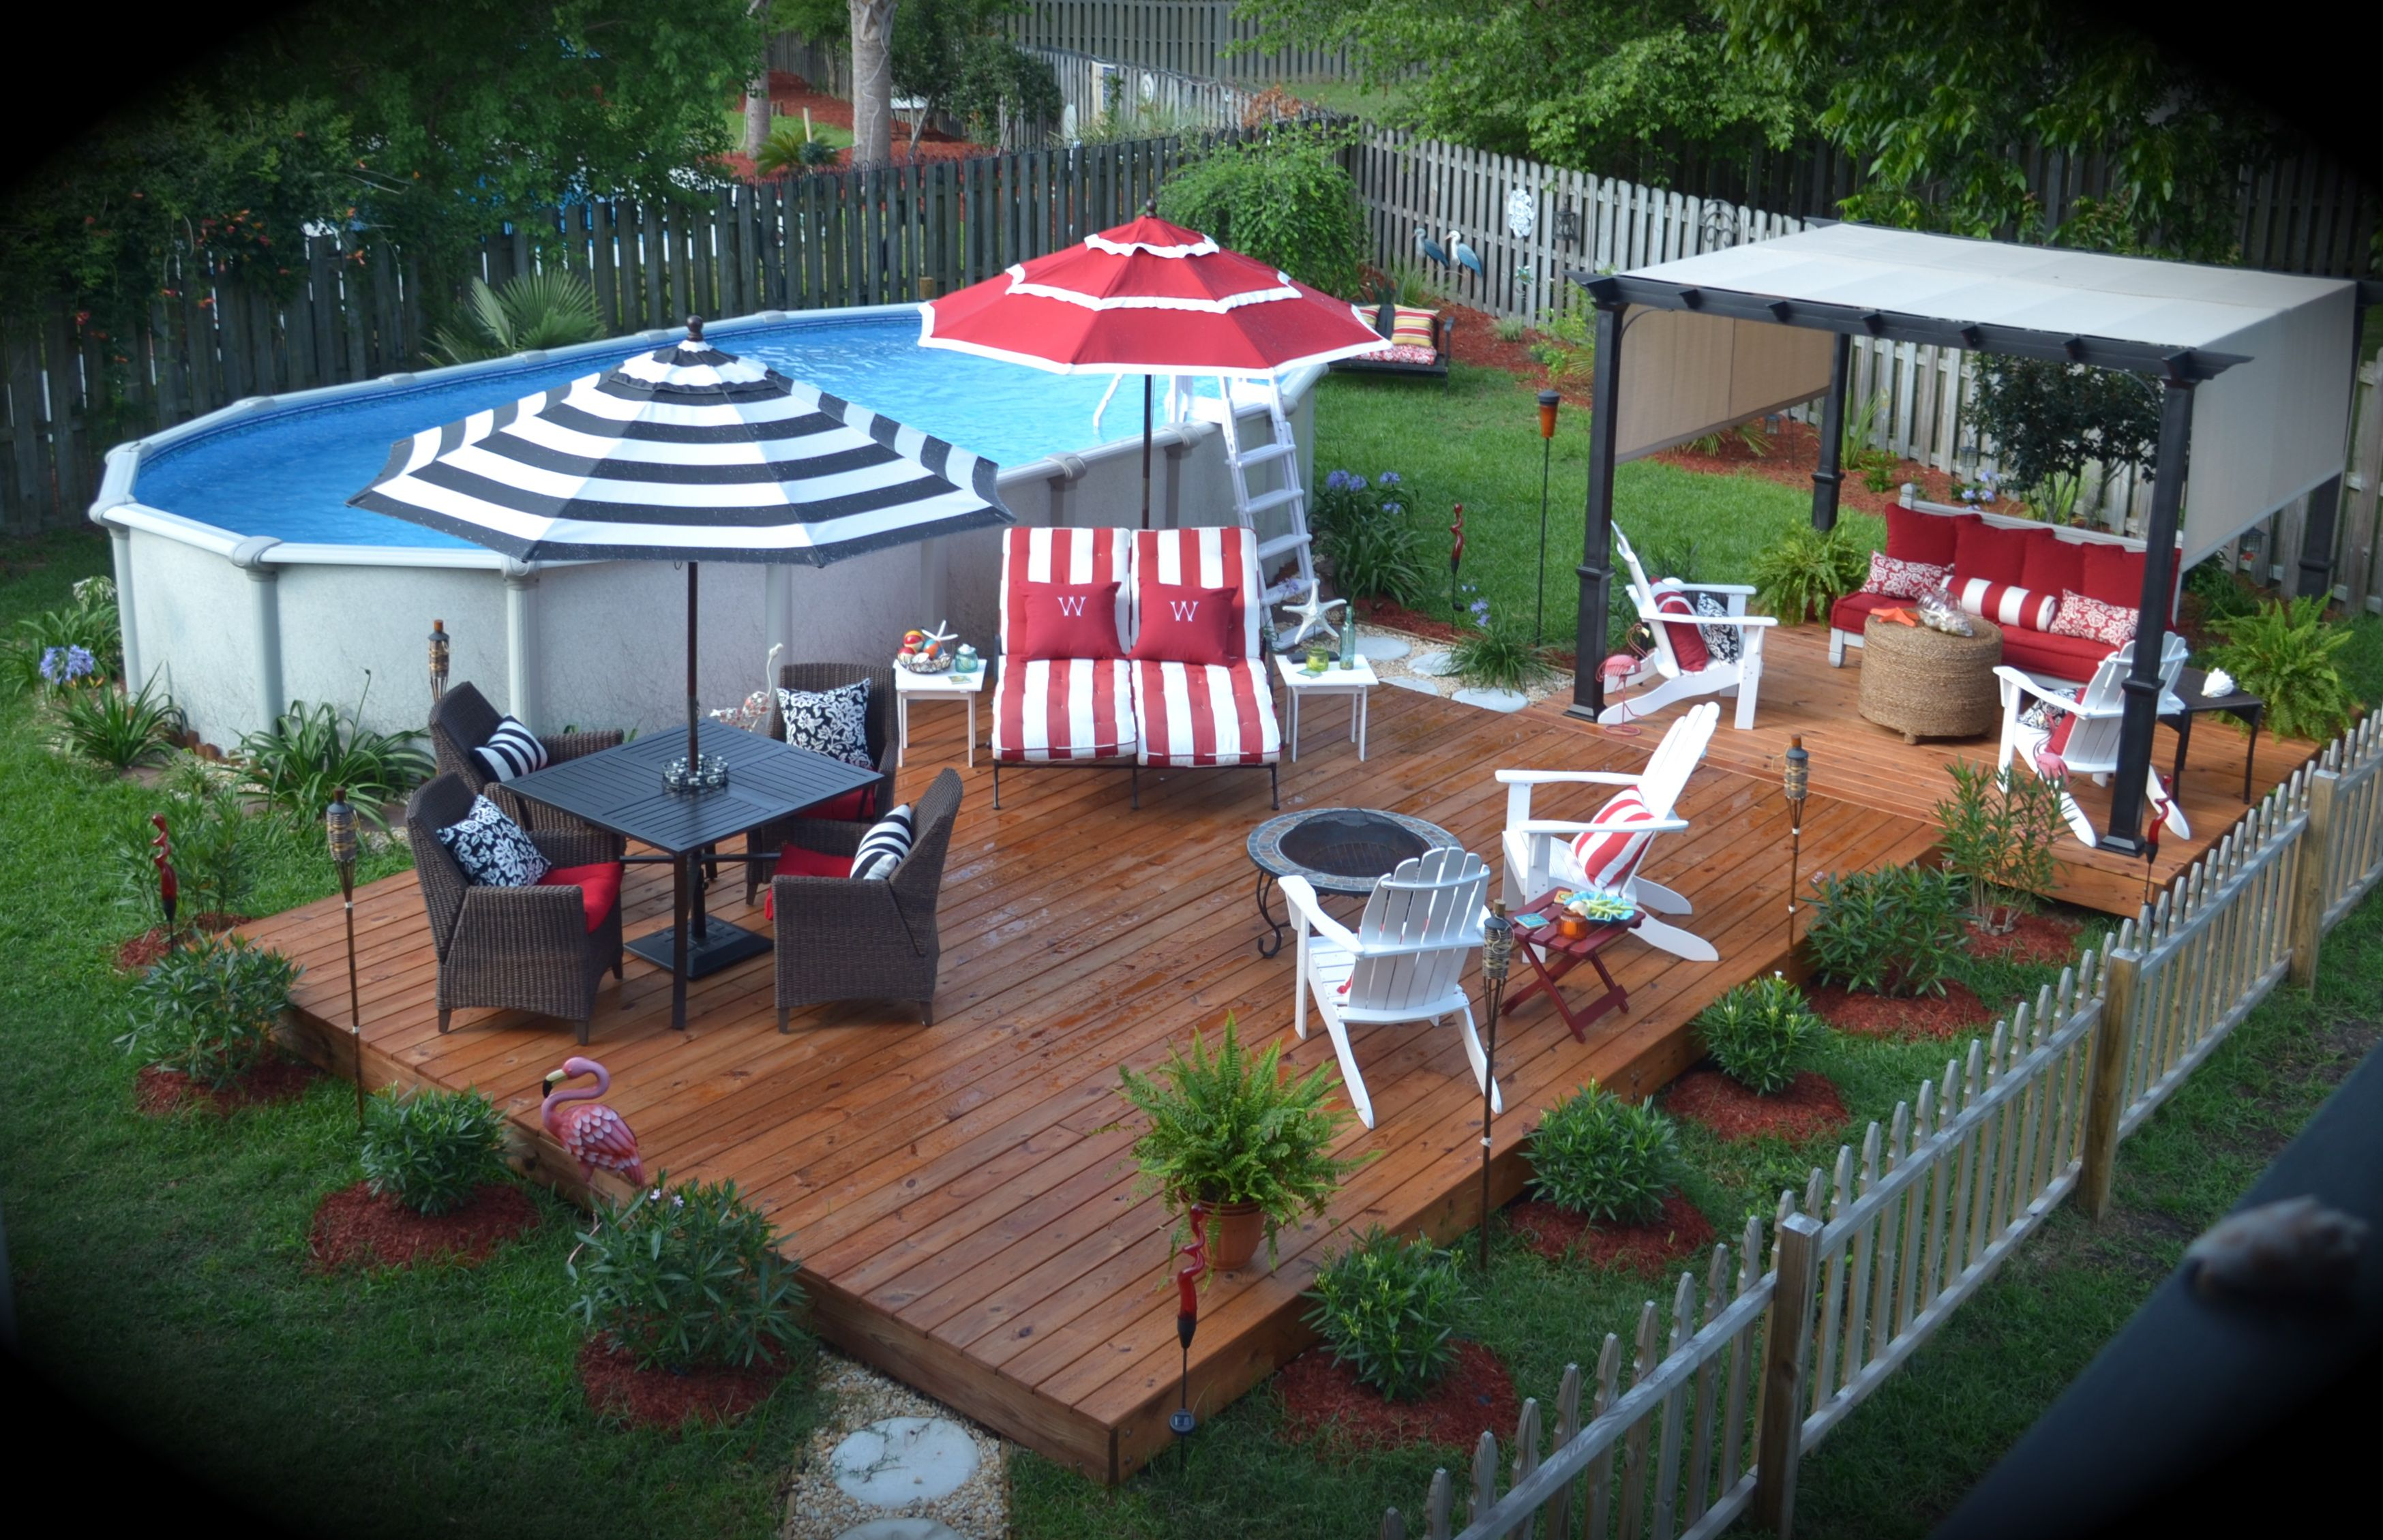 Outdoor ideas on pinterest above ground pool outdoor - Backyard above ground pool ideas ...